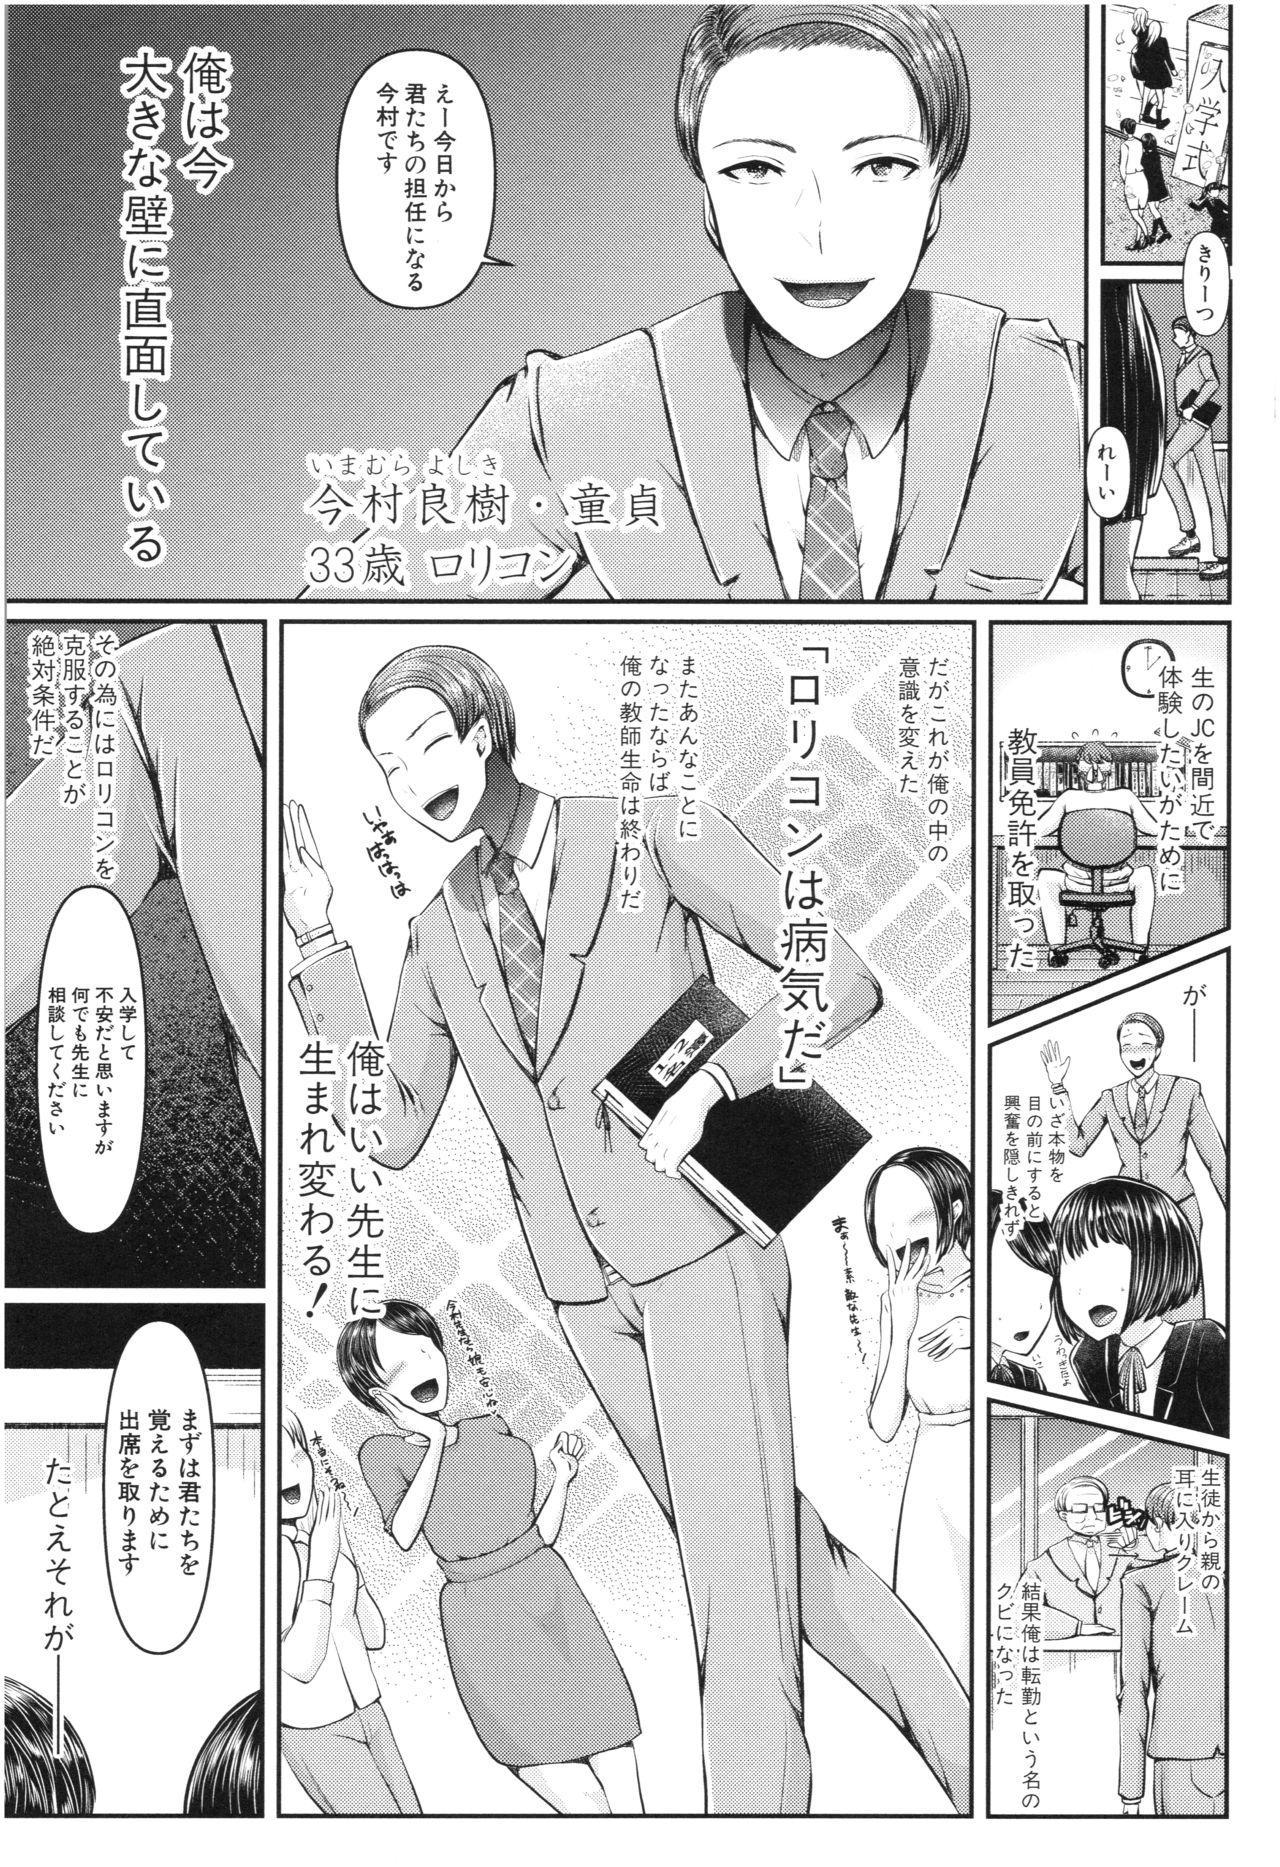 Sannenkan no Aoi Haru 5